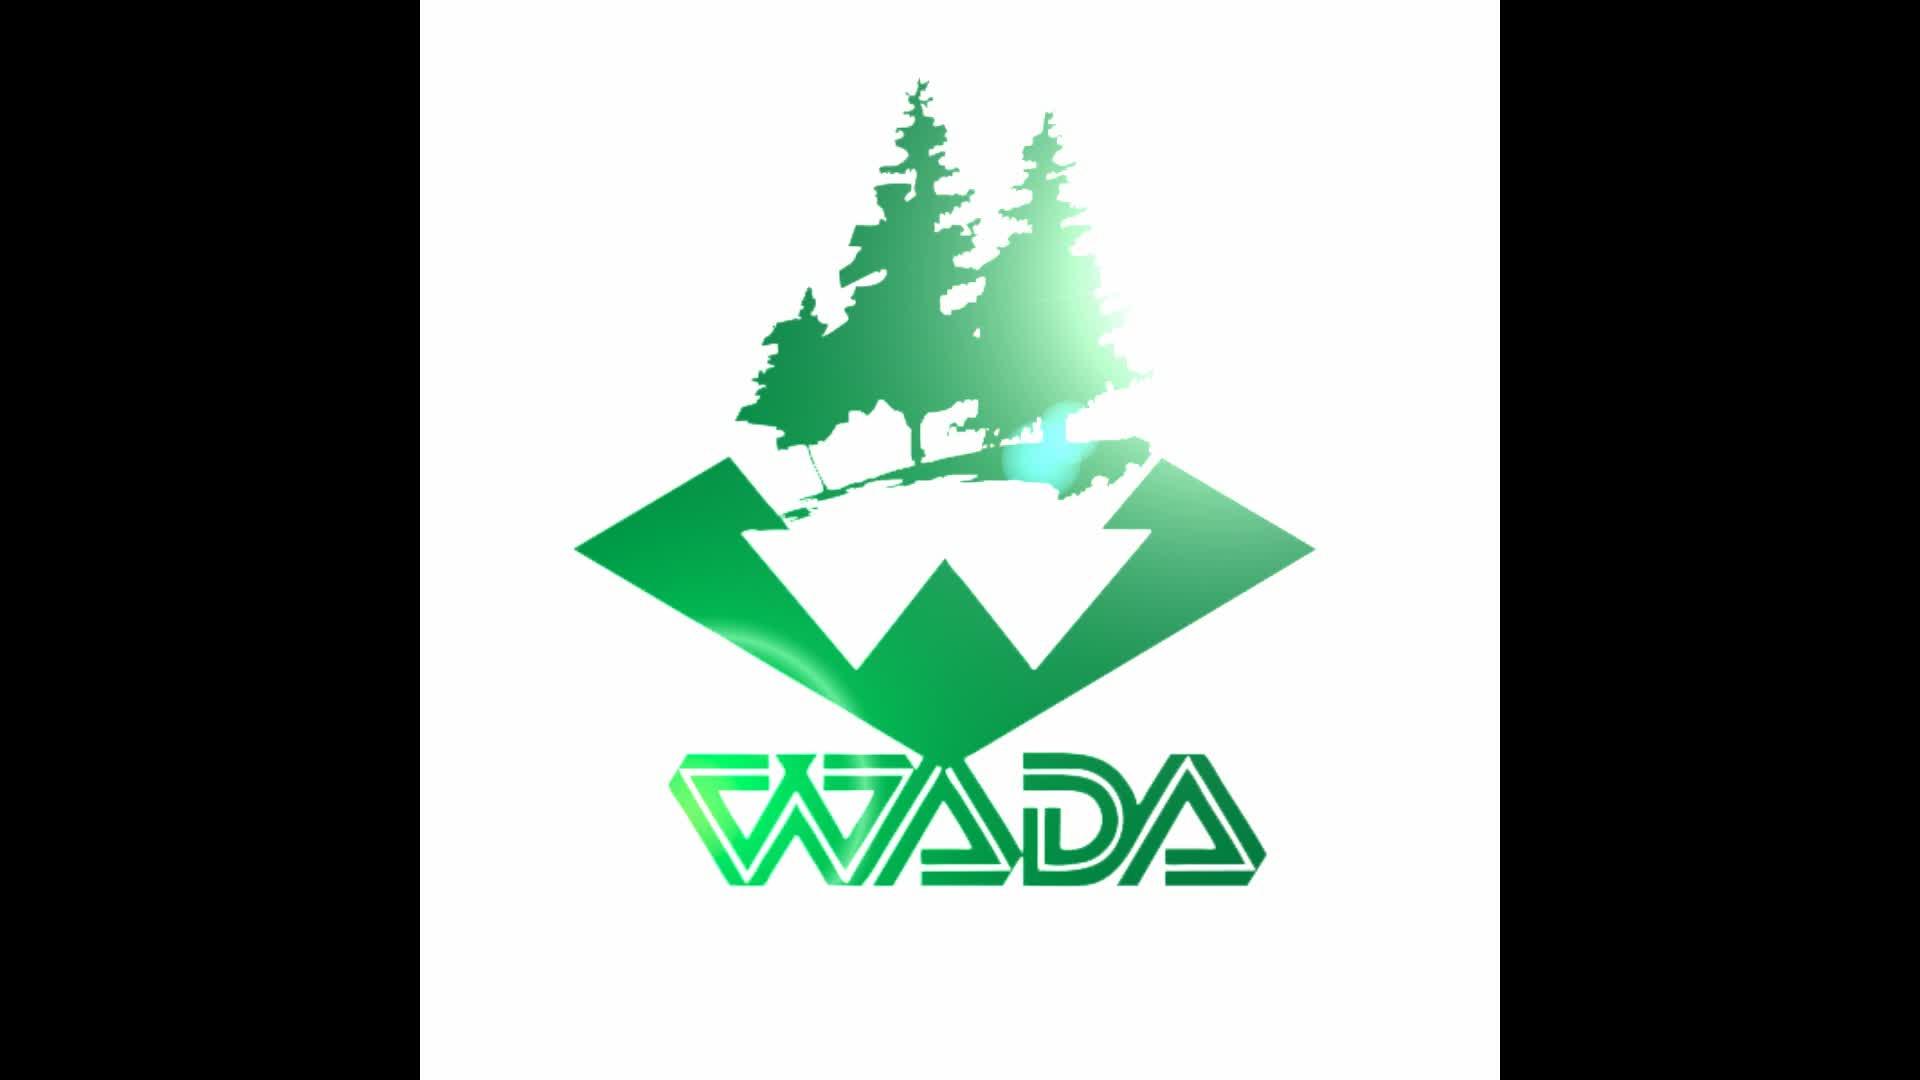 wada poplar overlap joint lvl plywood wood veneer bed slats